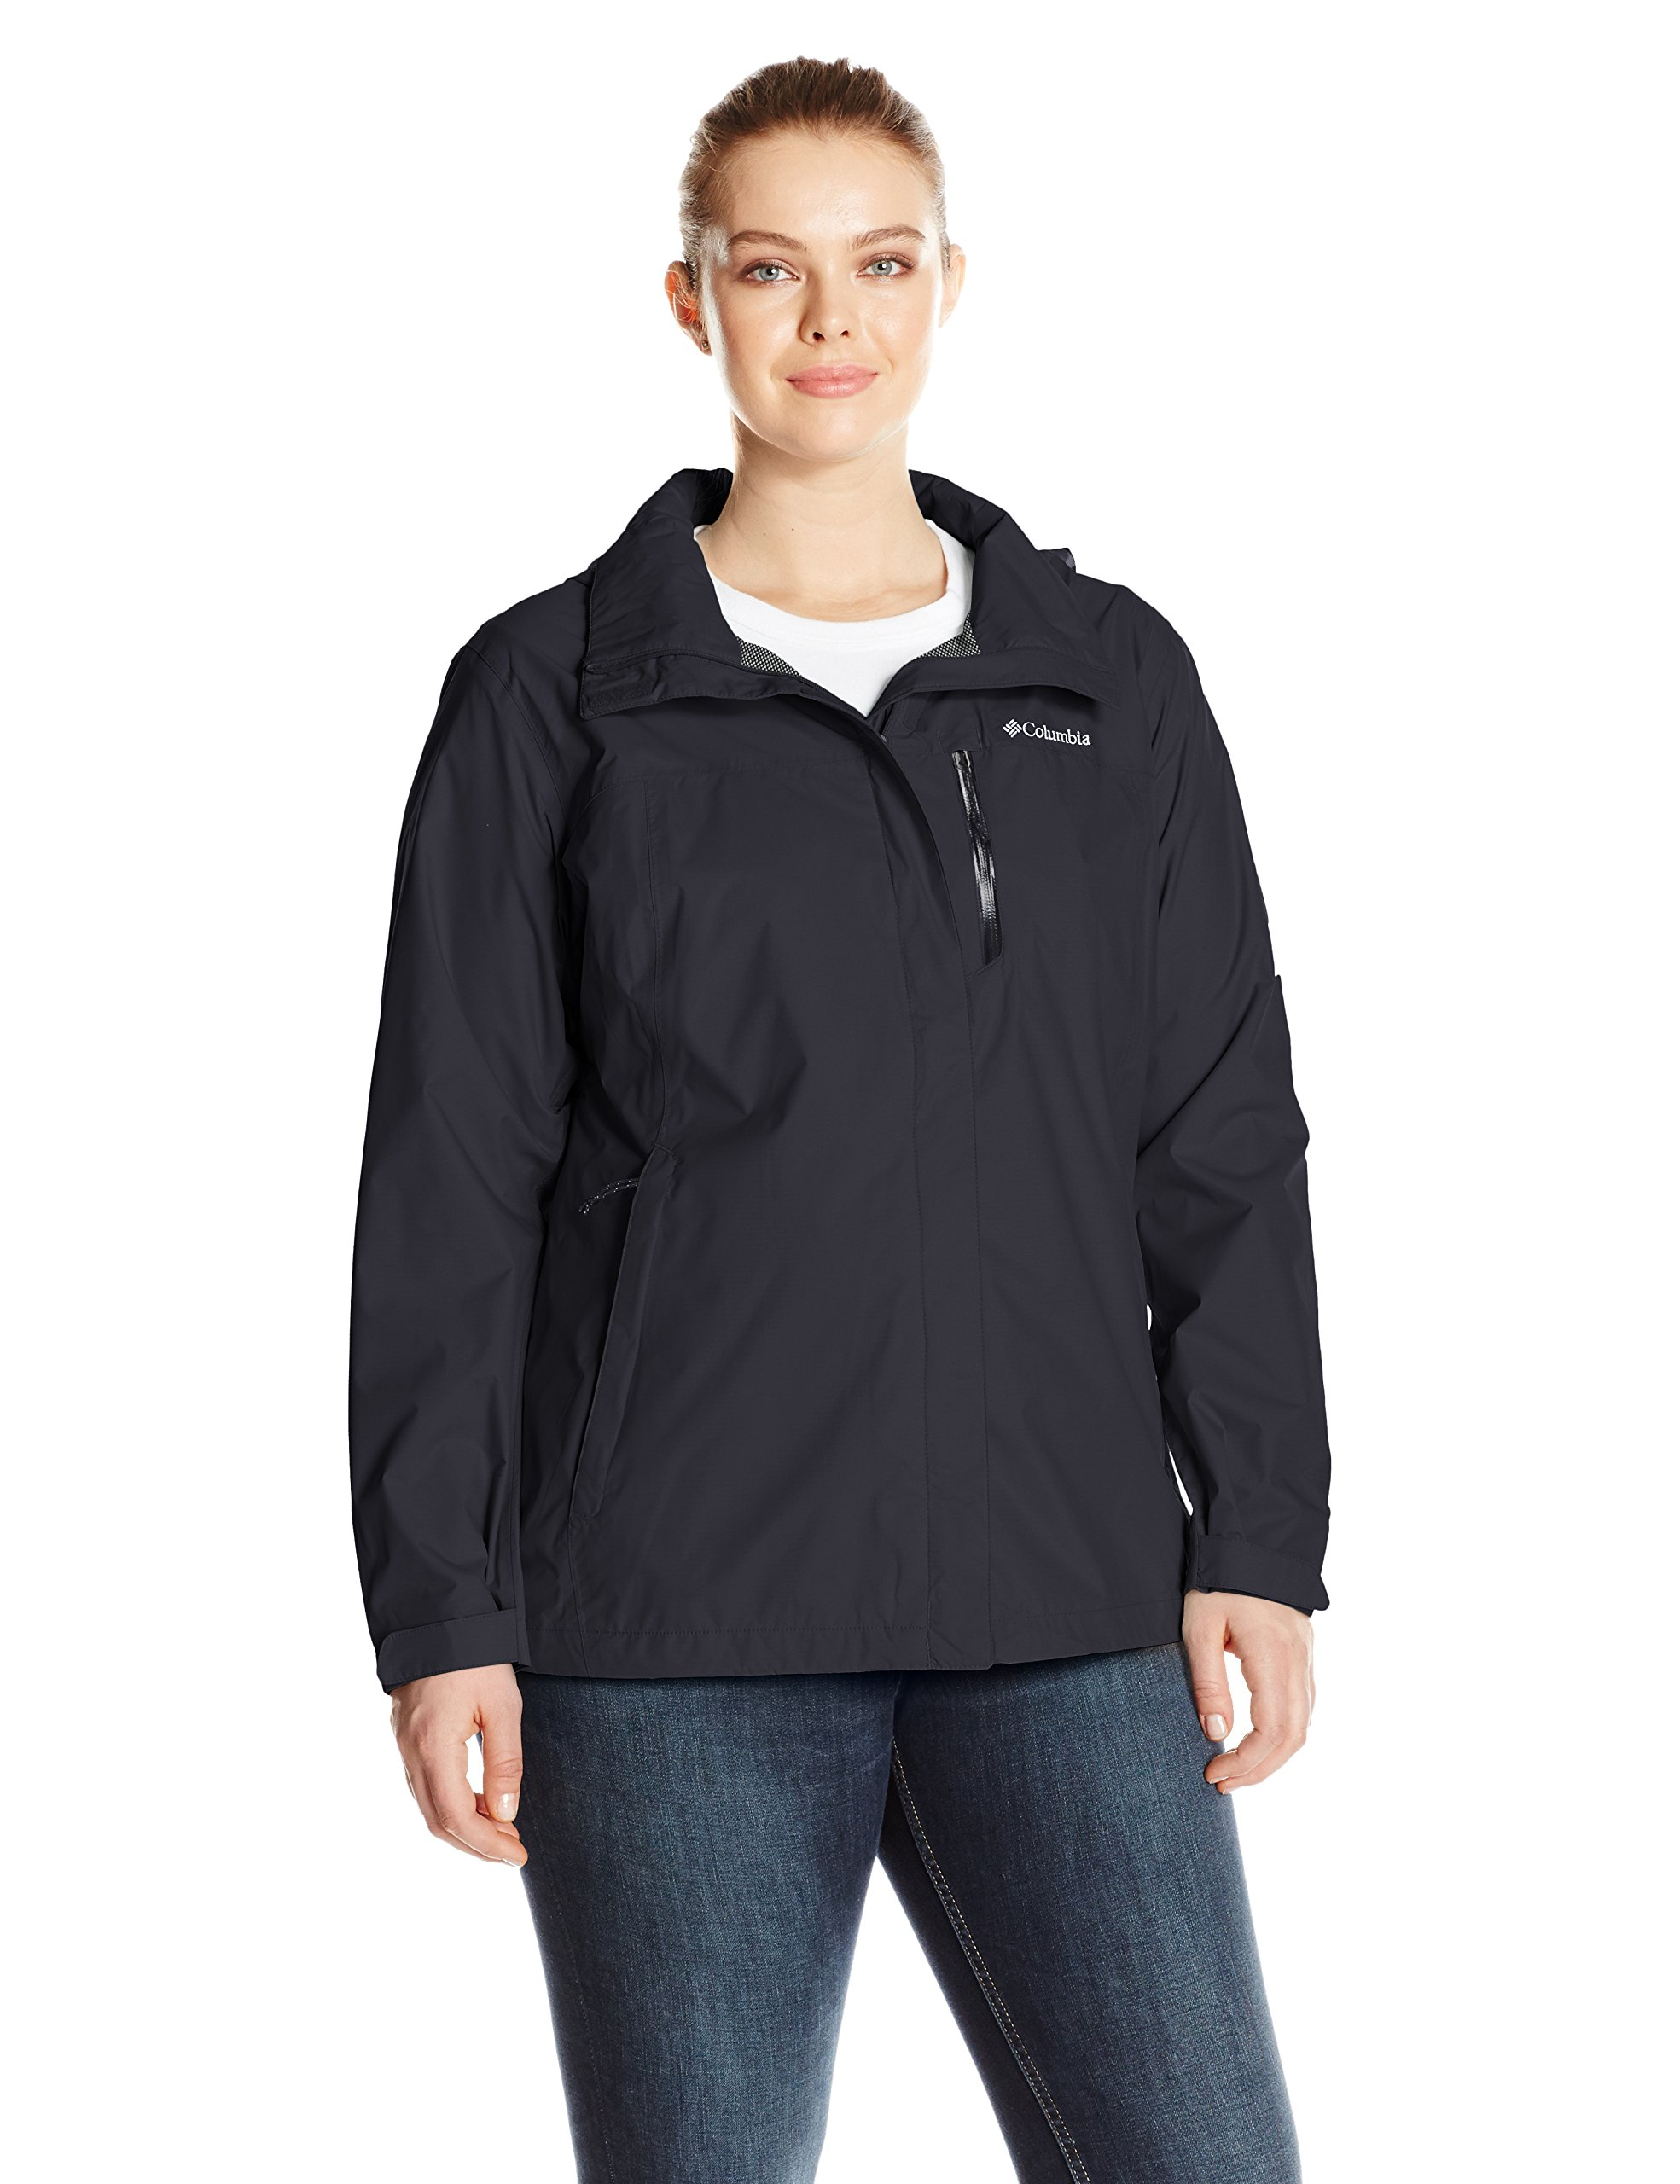 Columbia Women's Pouration Plus Size Jacket, Black, 3X